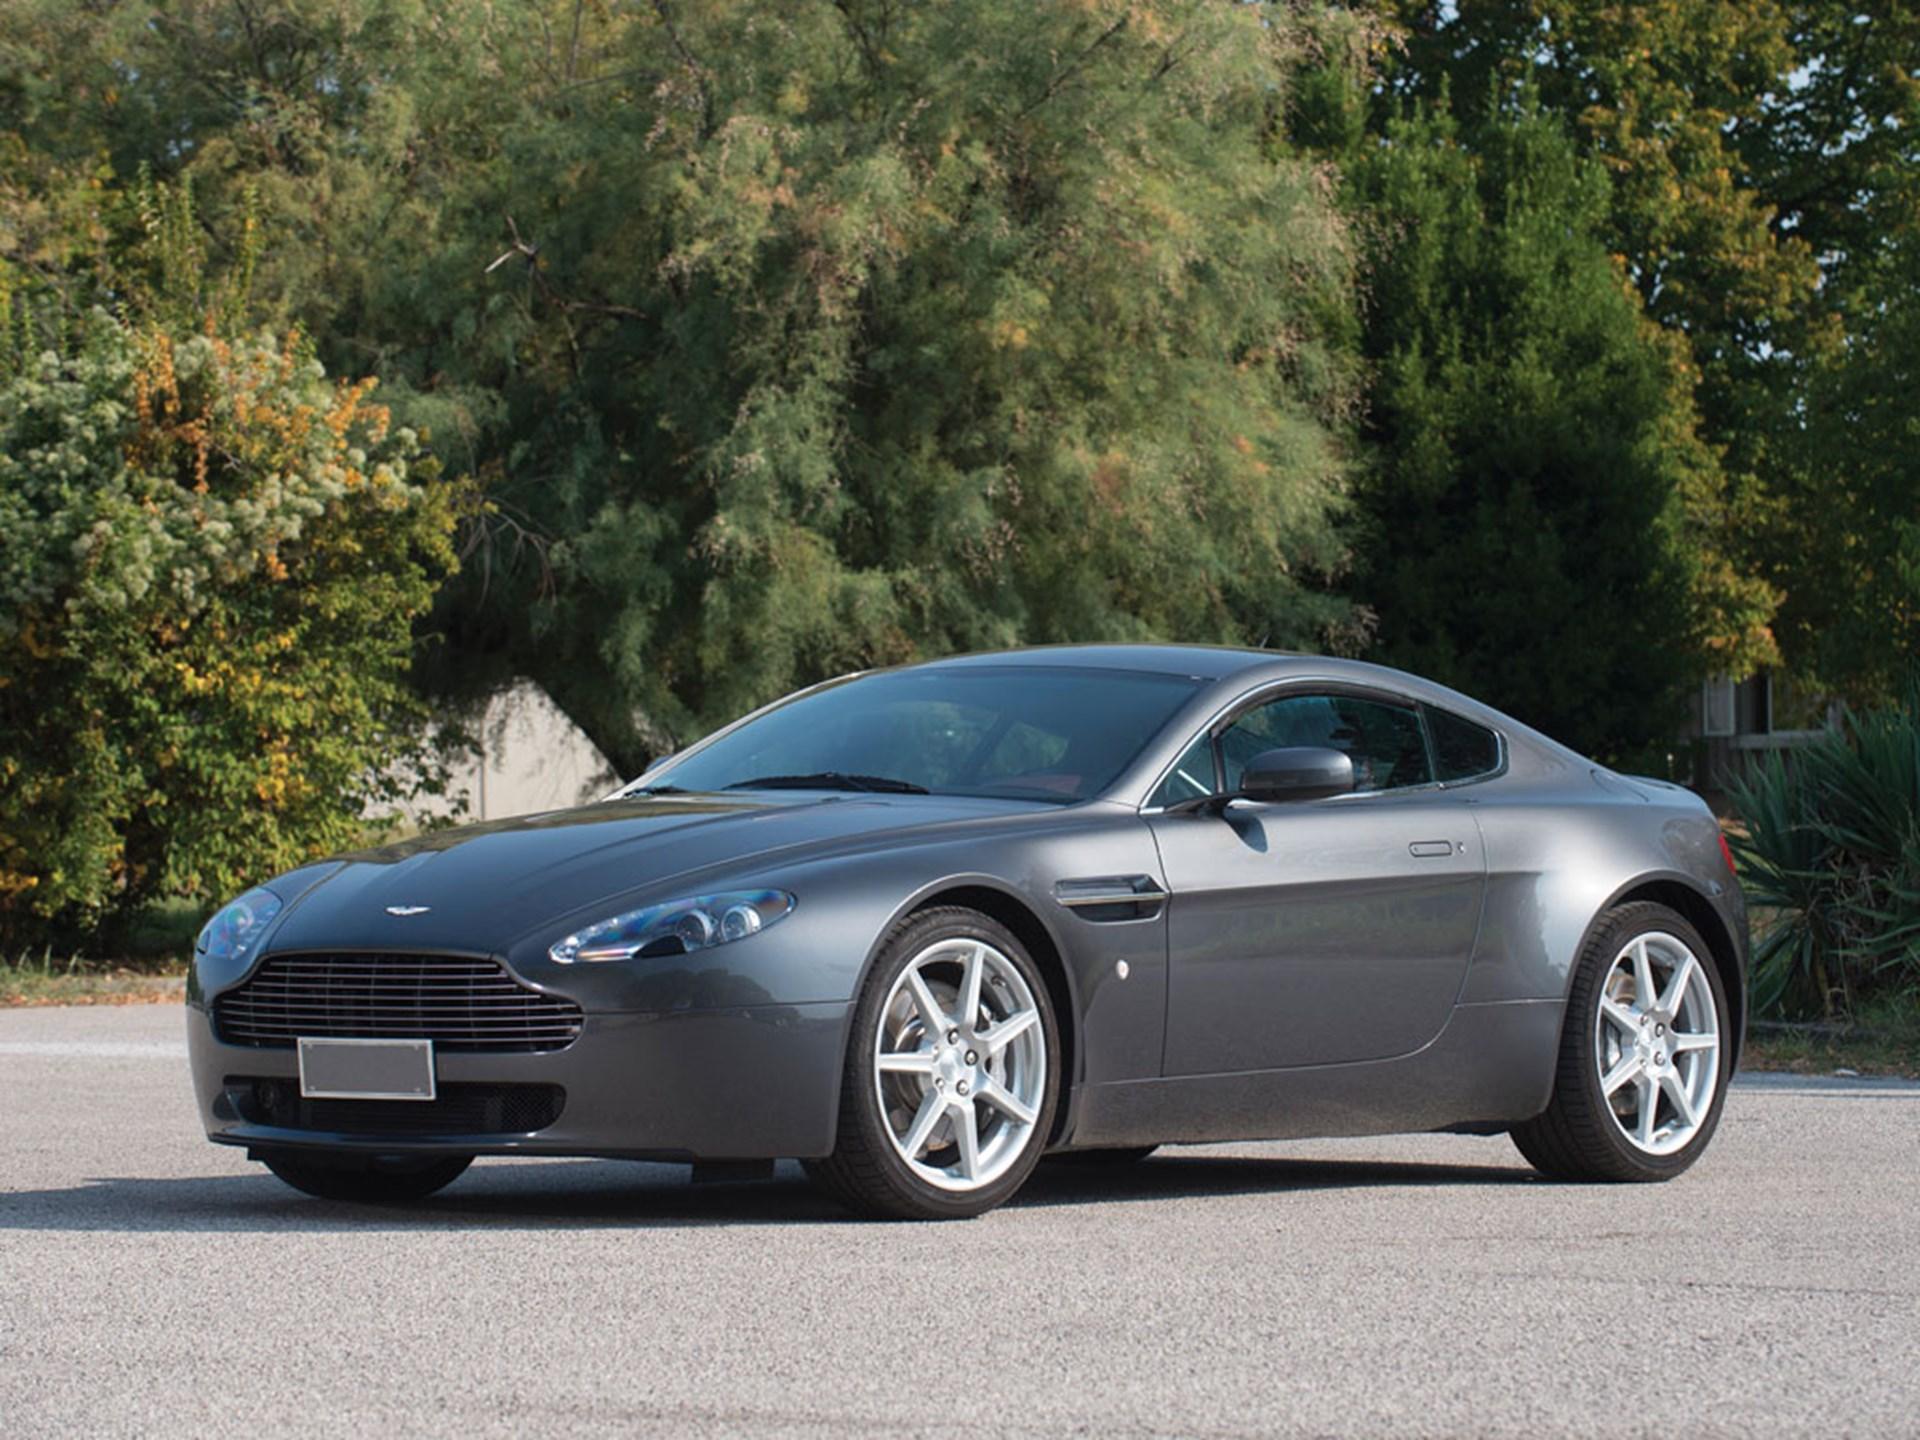 RM Sothebys Aston Martin V Vantage Duemila Ruote - 2007 aston martin v8 vantage